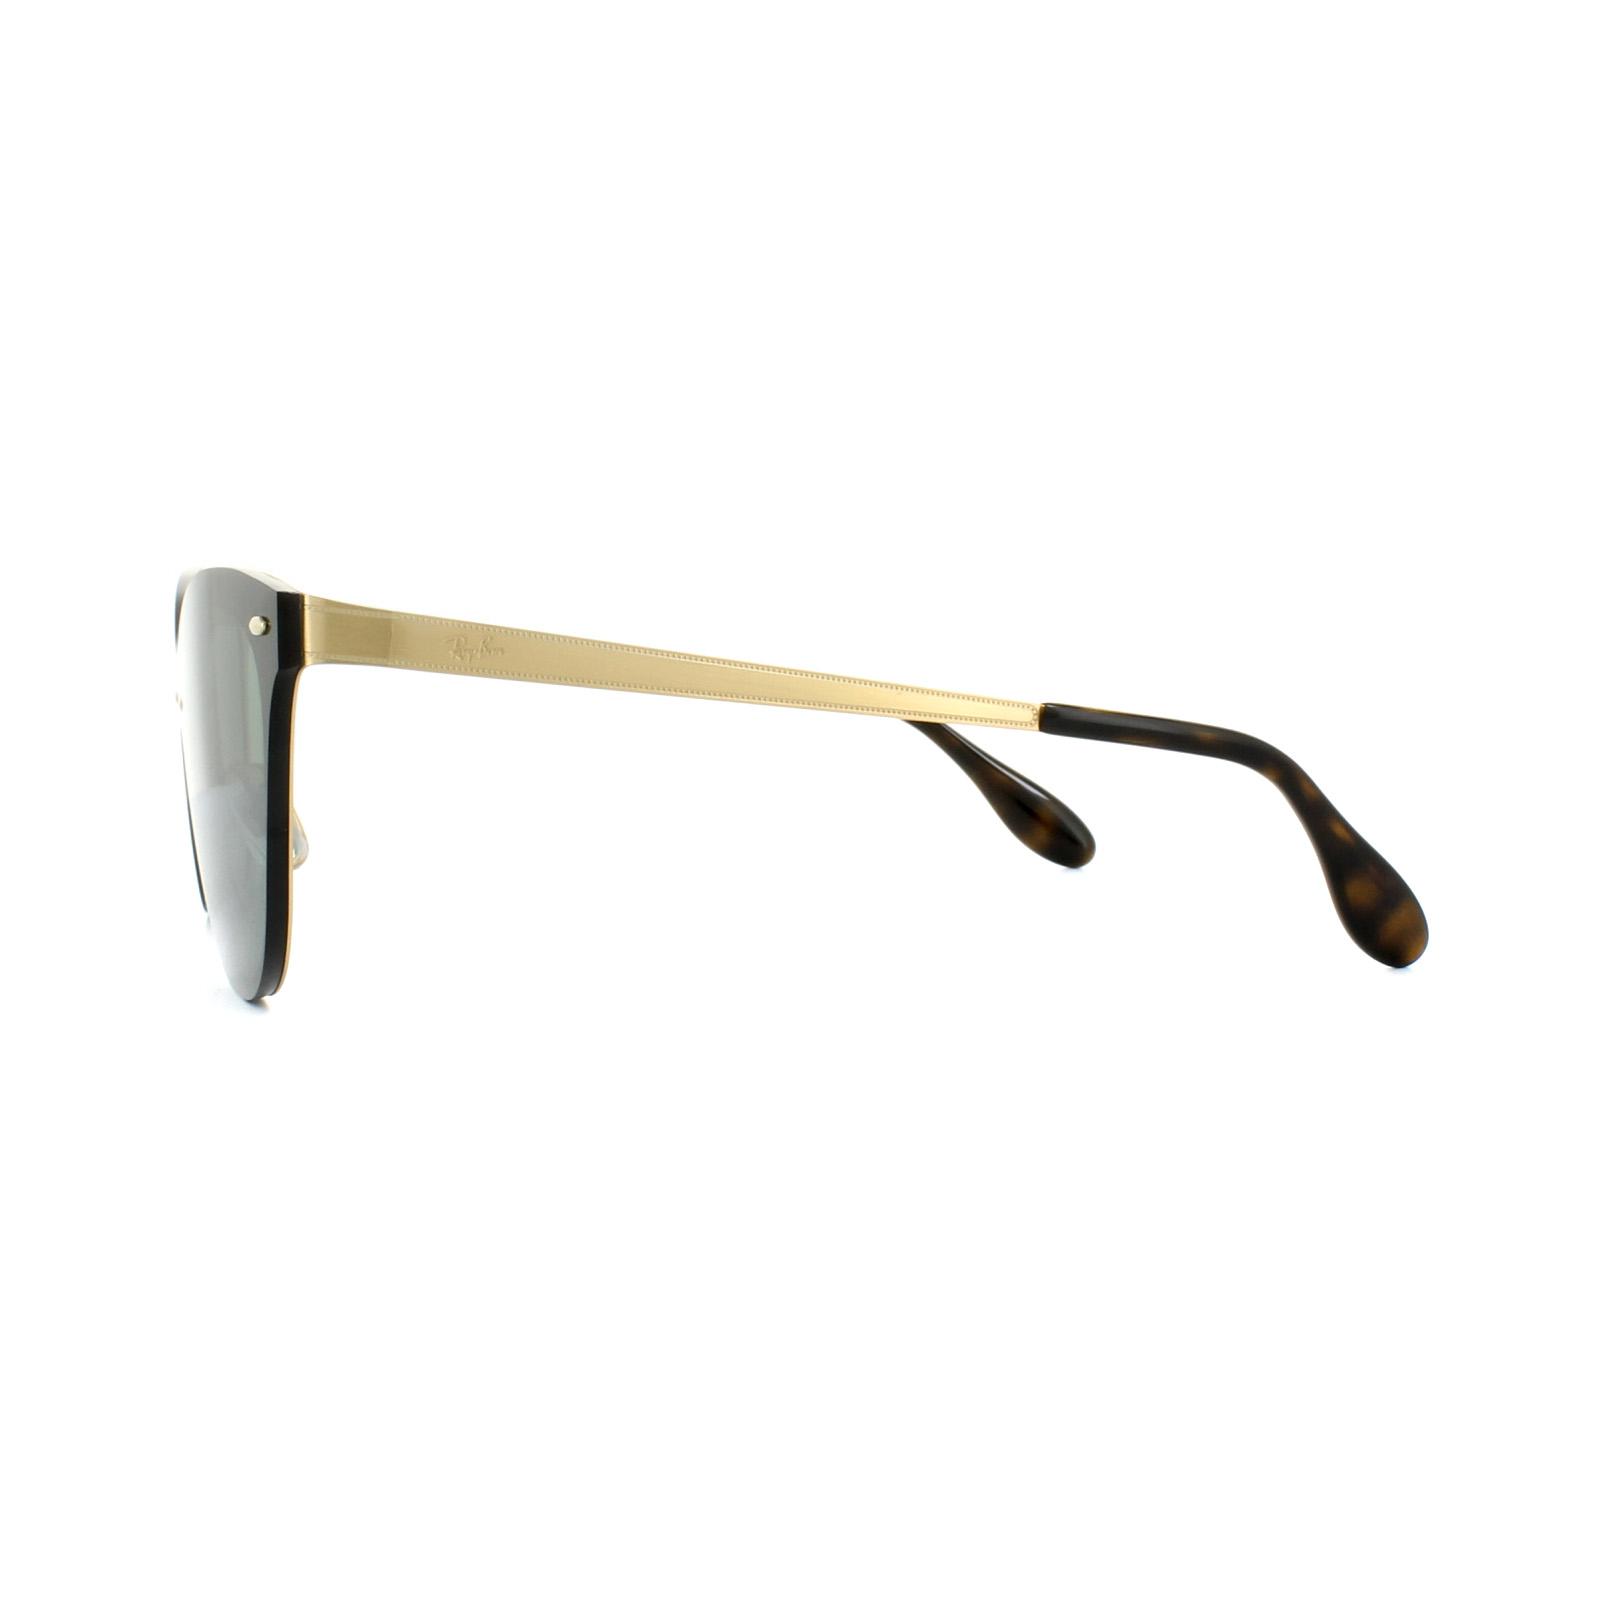 0b5c6c1659d88 CENTINELA Gafas de sol Ray-Ban Blaze ojo de gato 3580N 043 71 verde oro